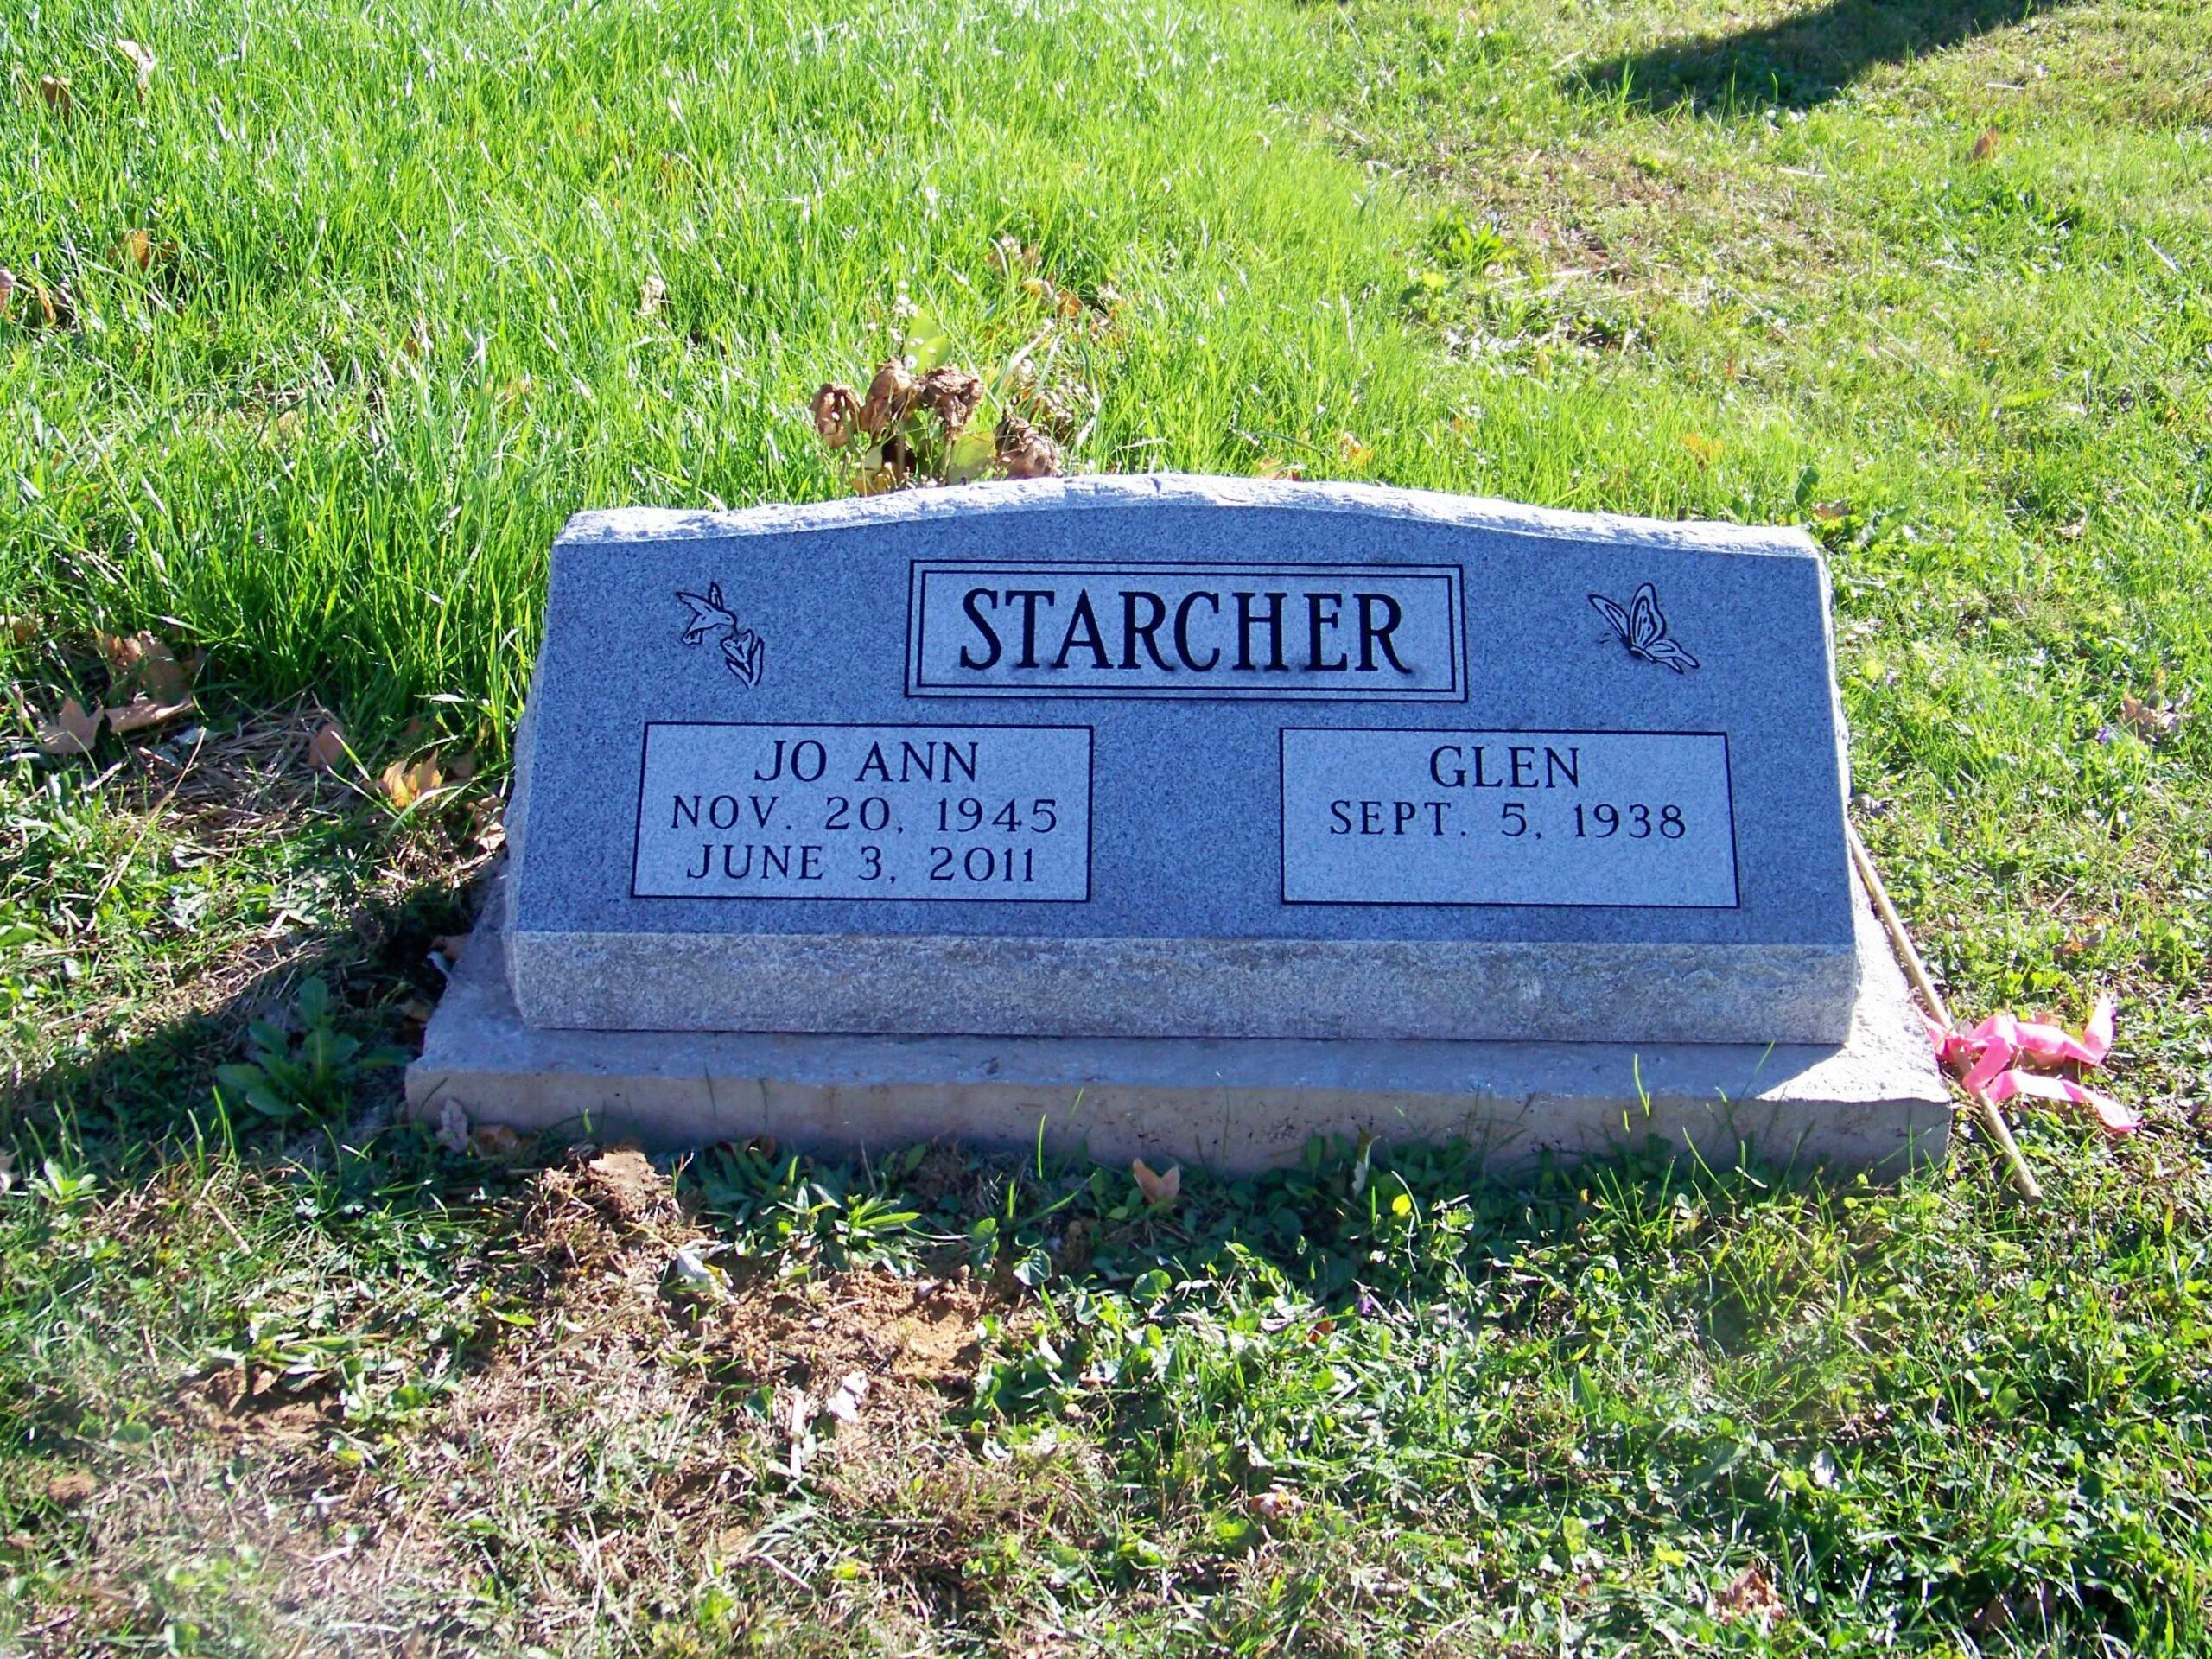 Starcher, Jo Ann